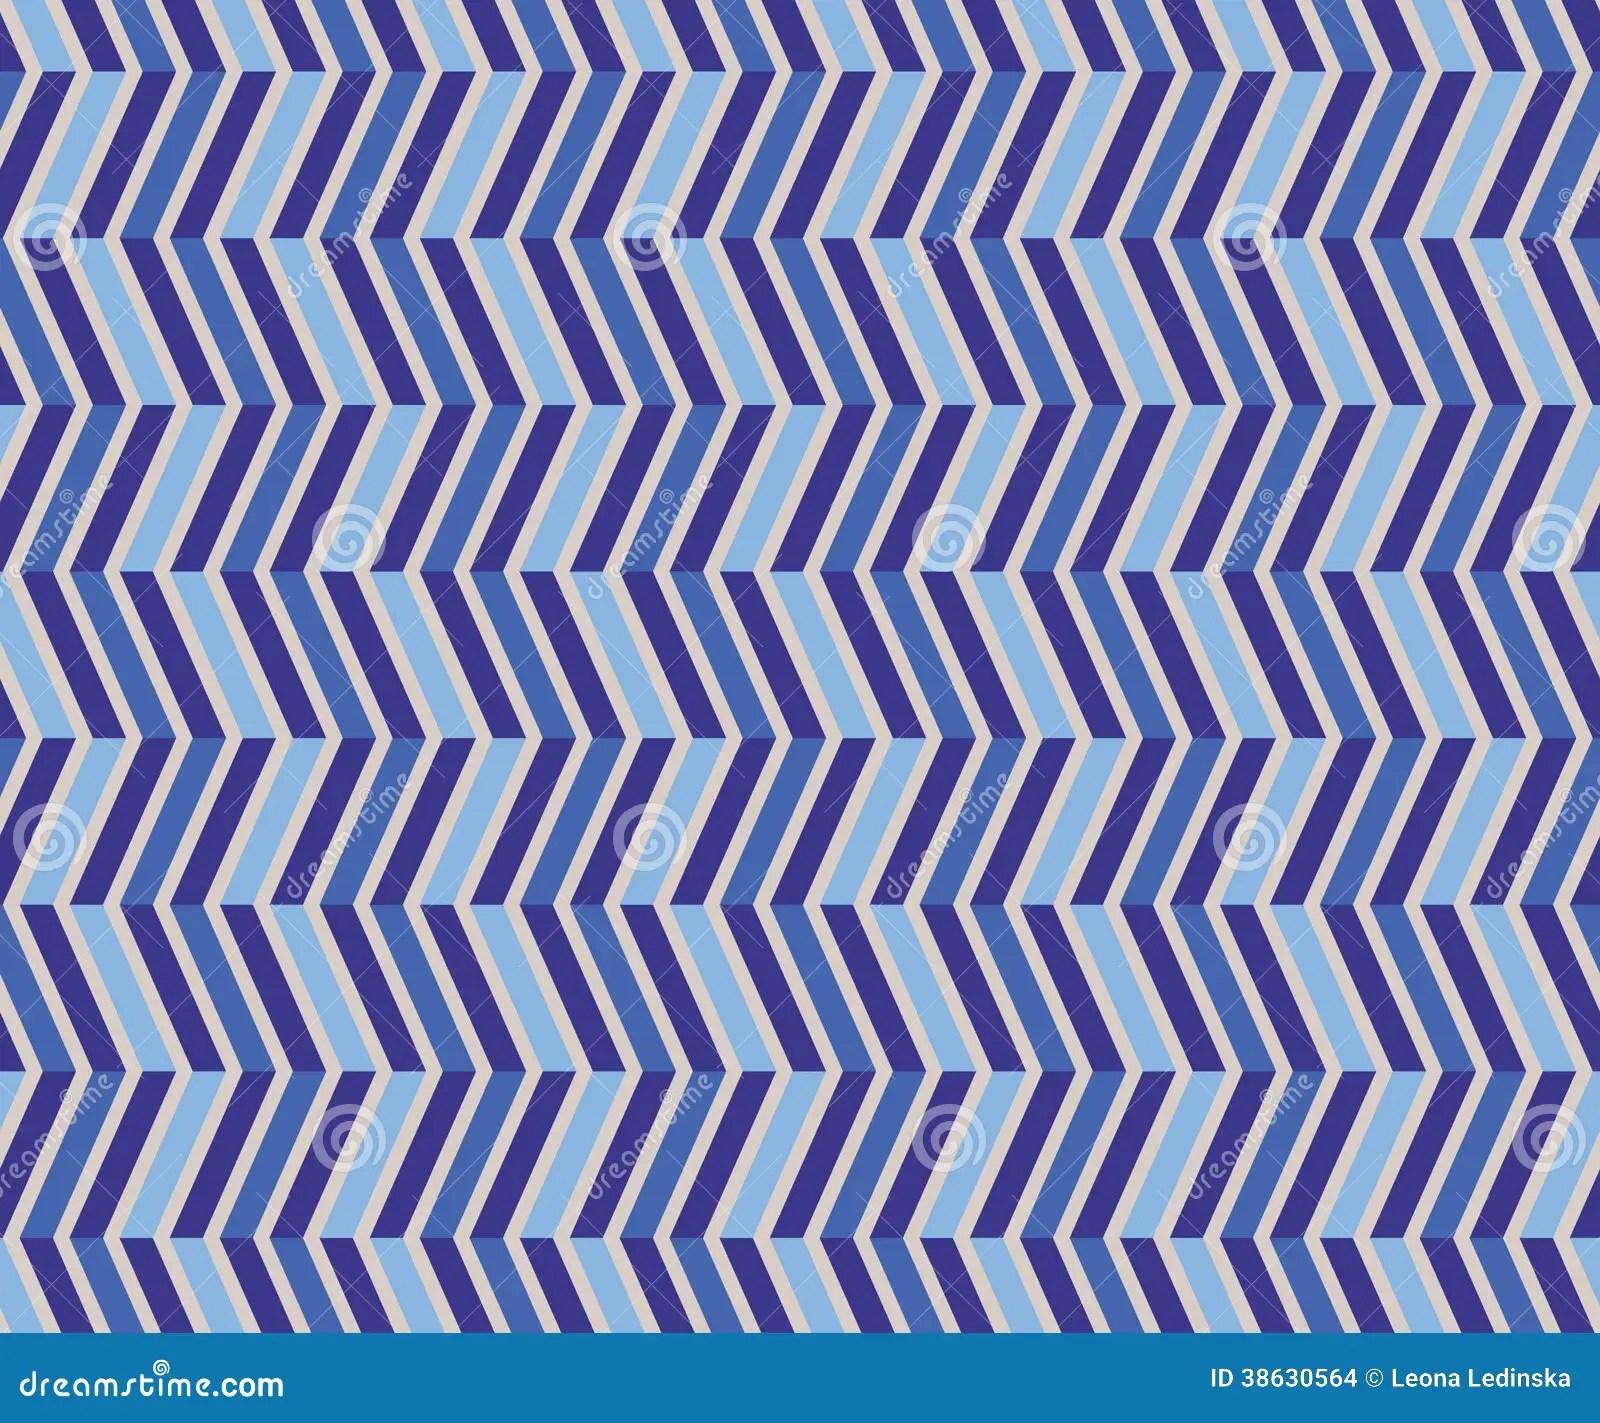 Zig Zag Blue Seamless Pattern Stock Images